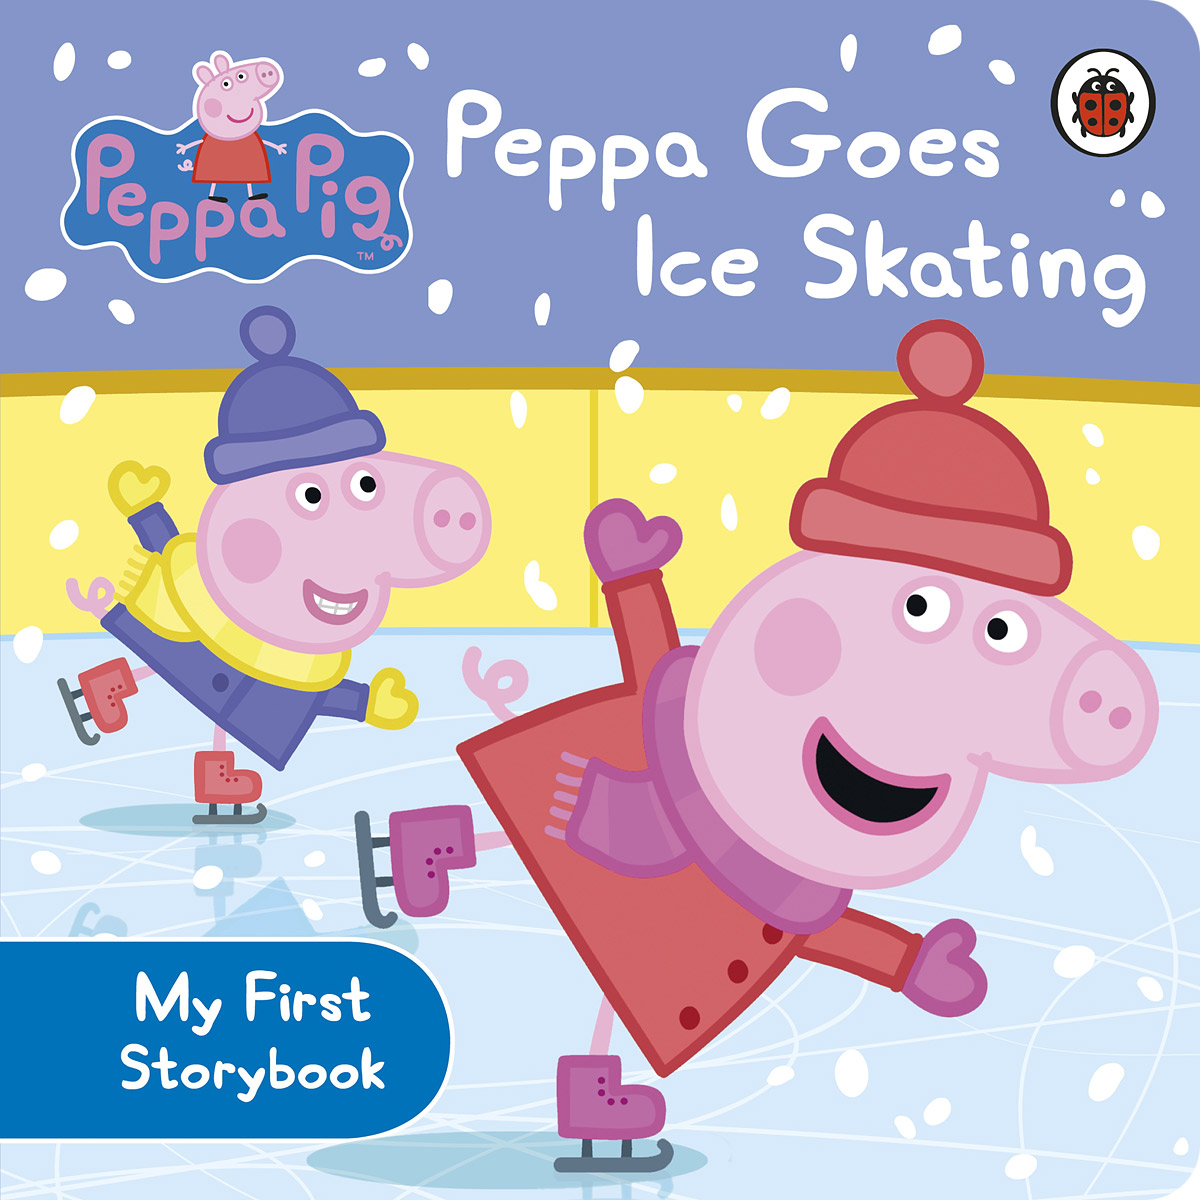 Peppa Pig: Peppa Goes Ice Skating peppa pig peppa goes ice skating board bk